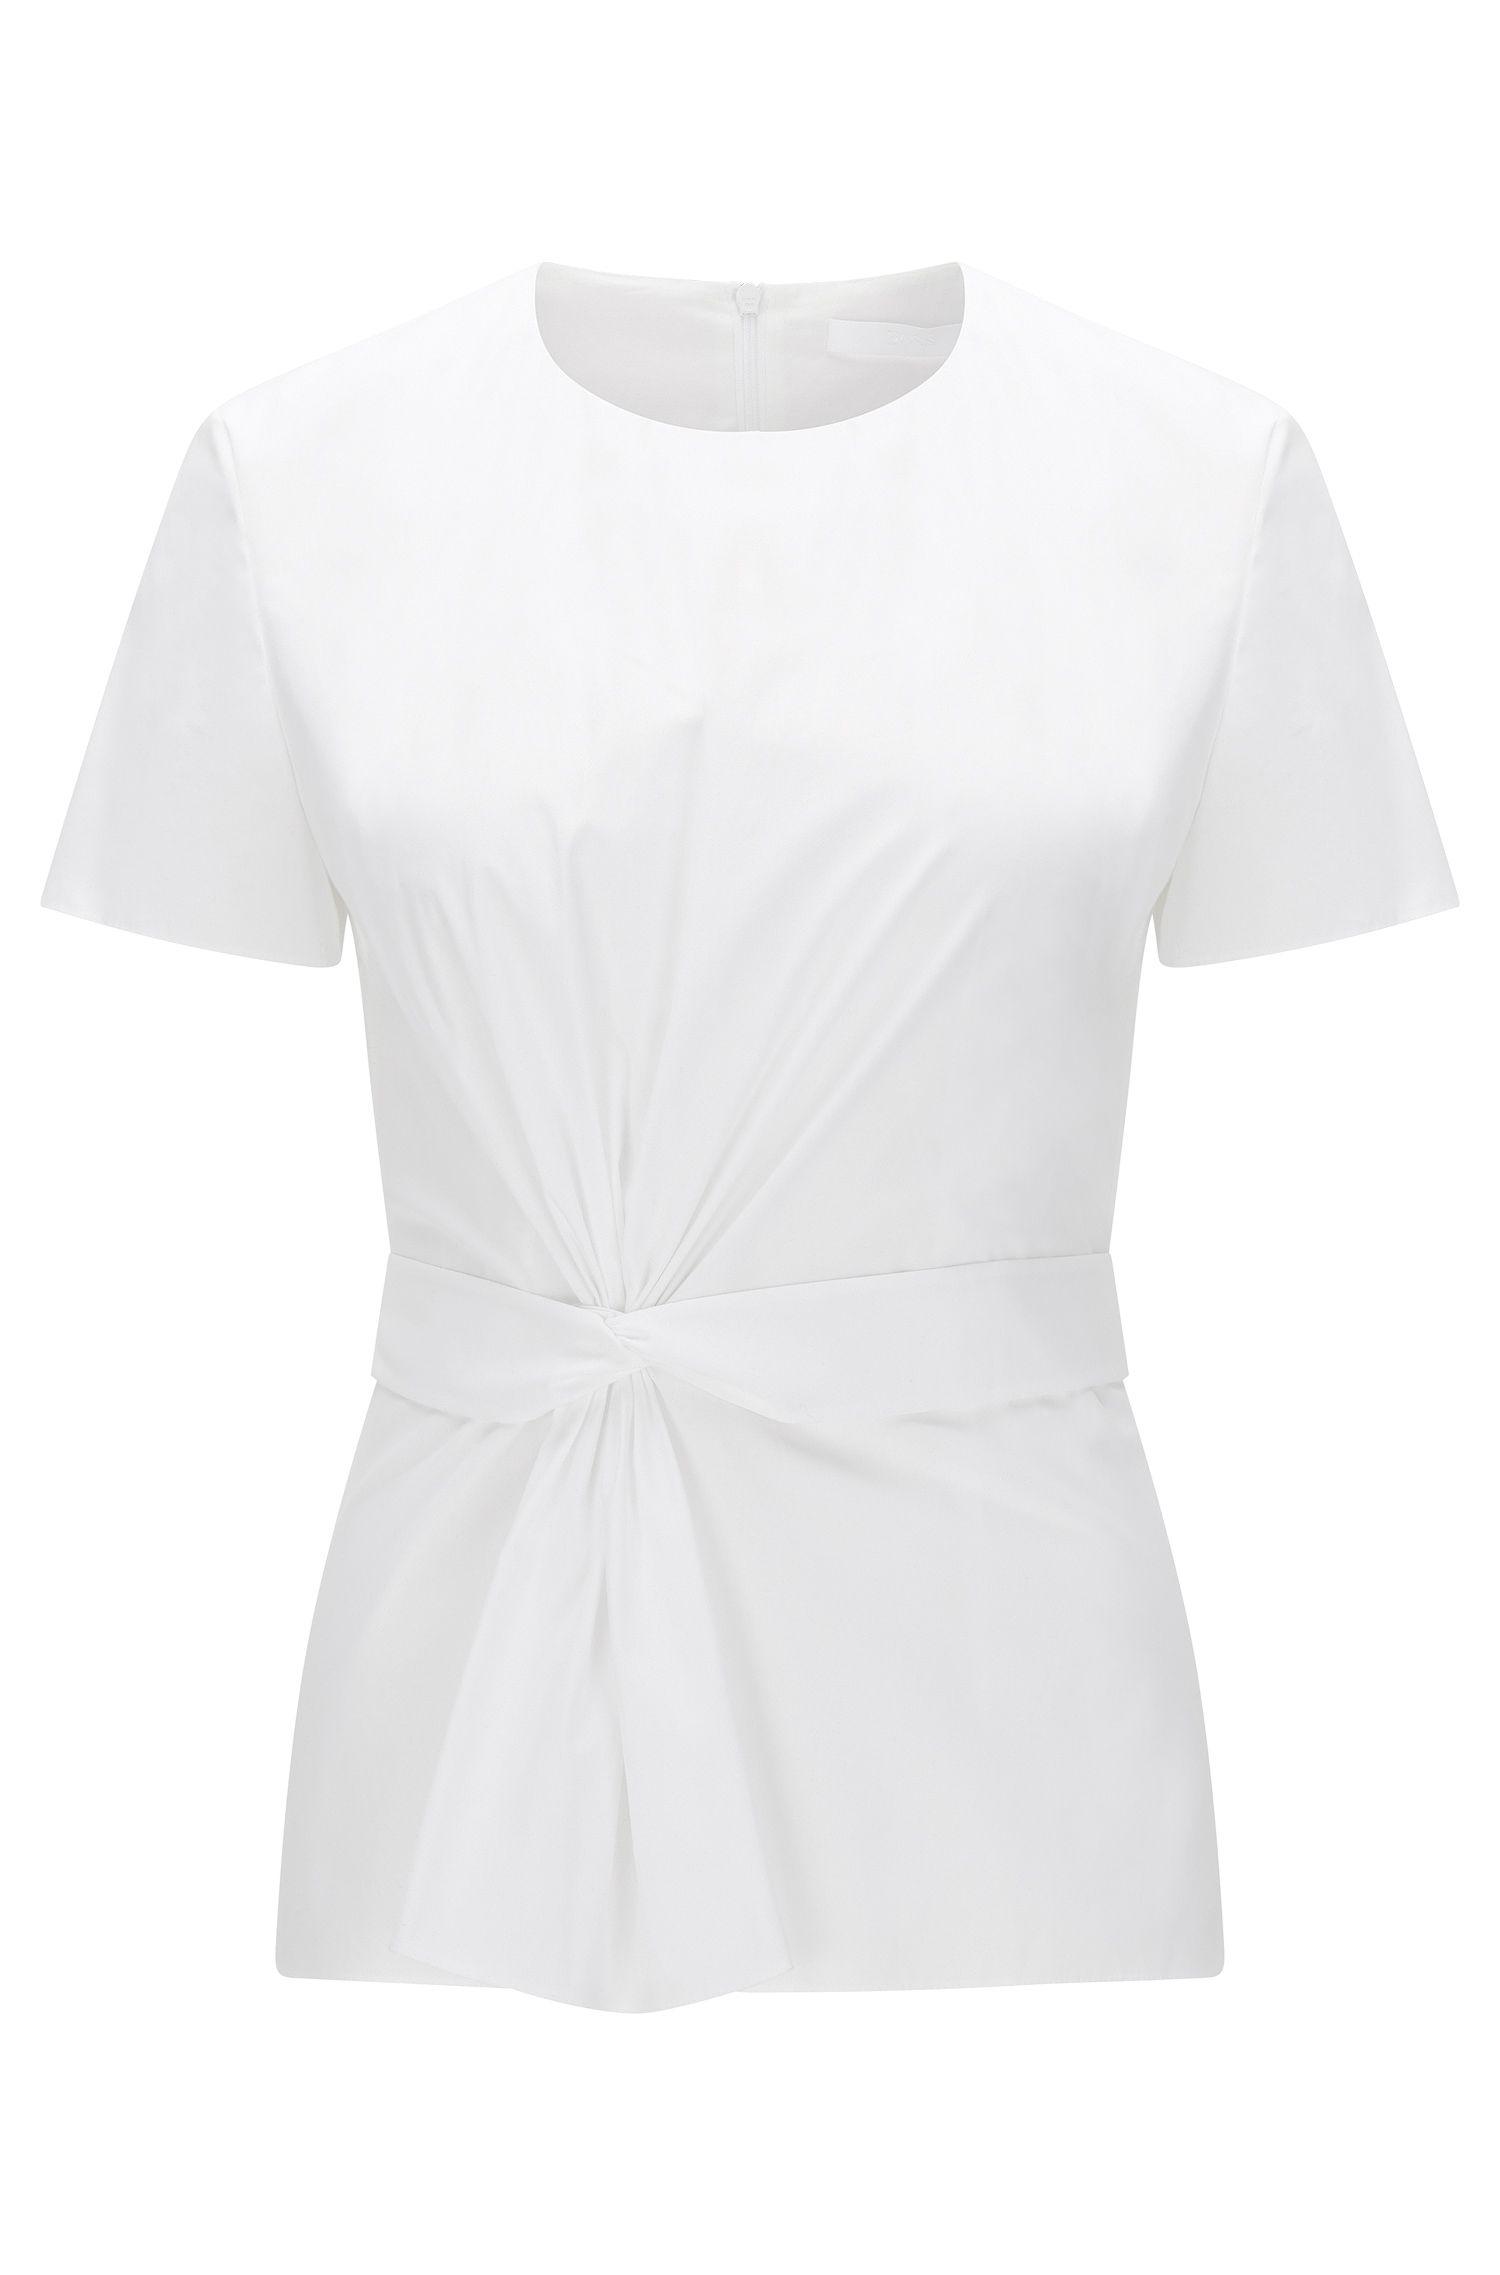 'Igiana' | Stretch Cotton Pleated Twist Blouse